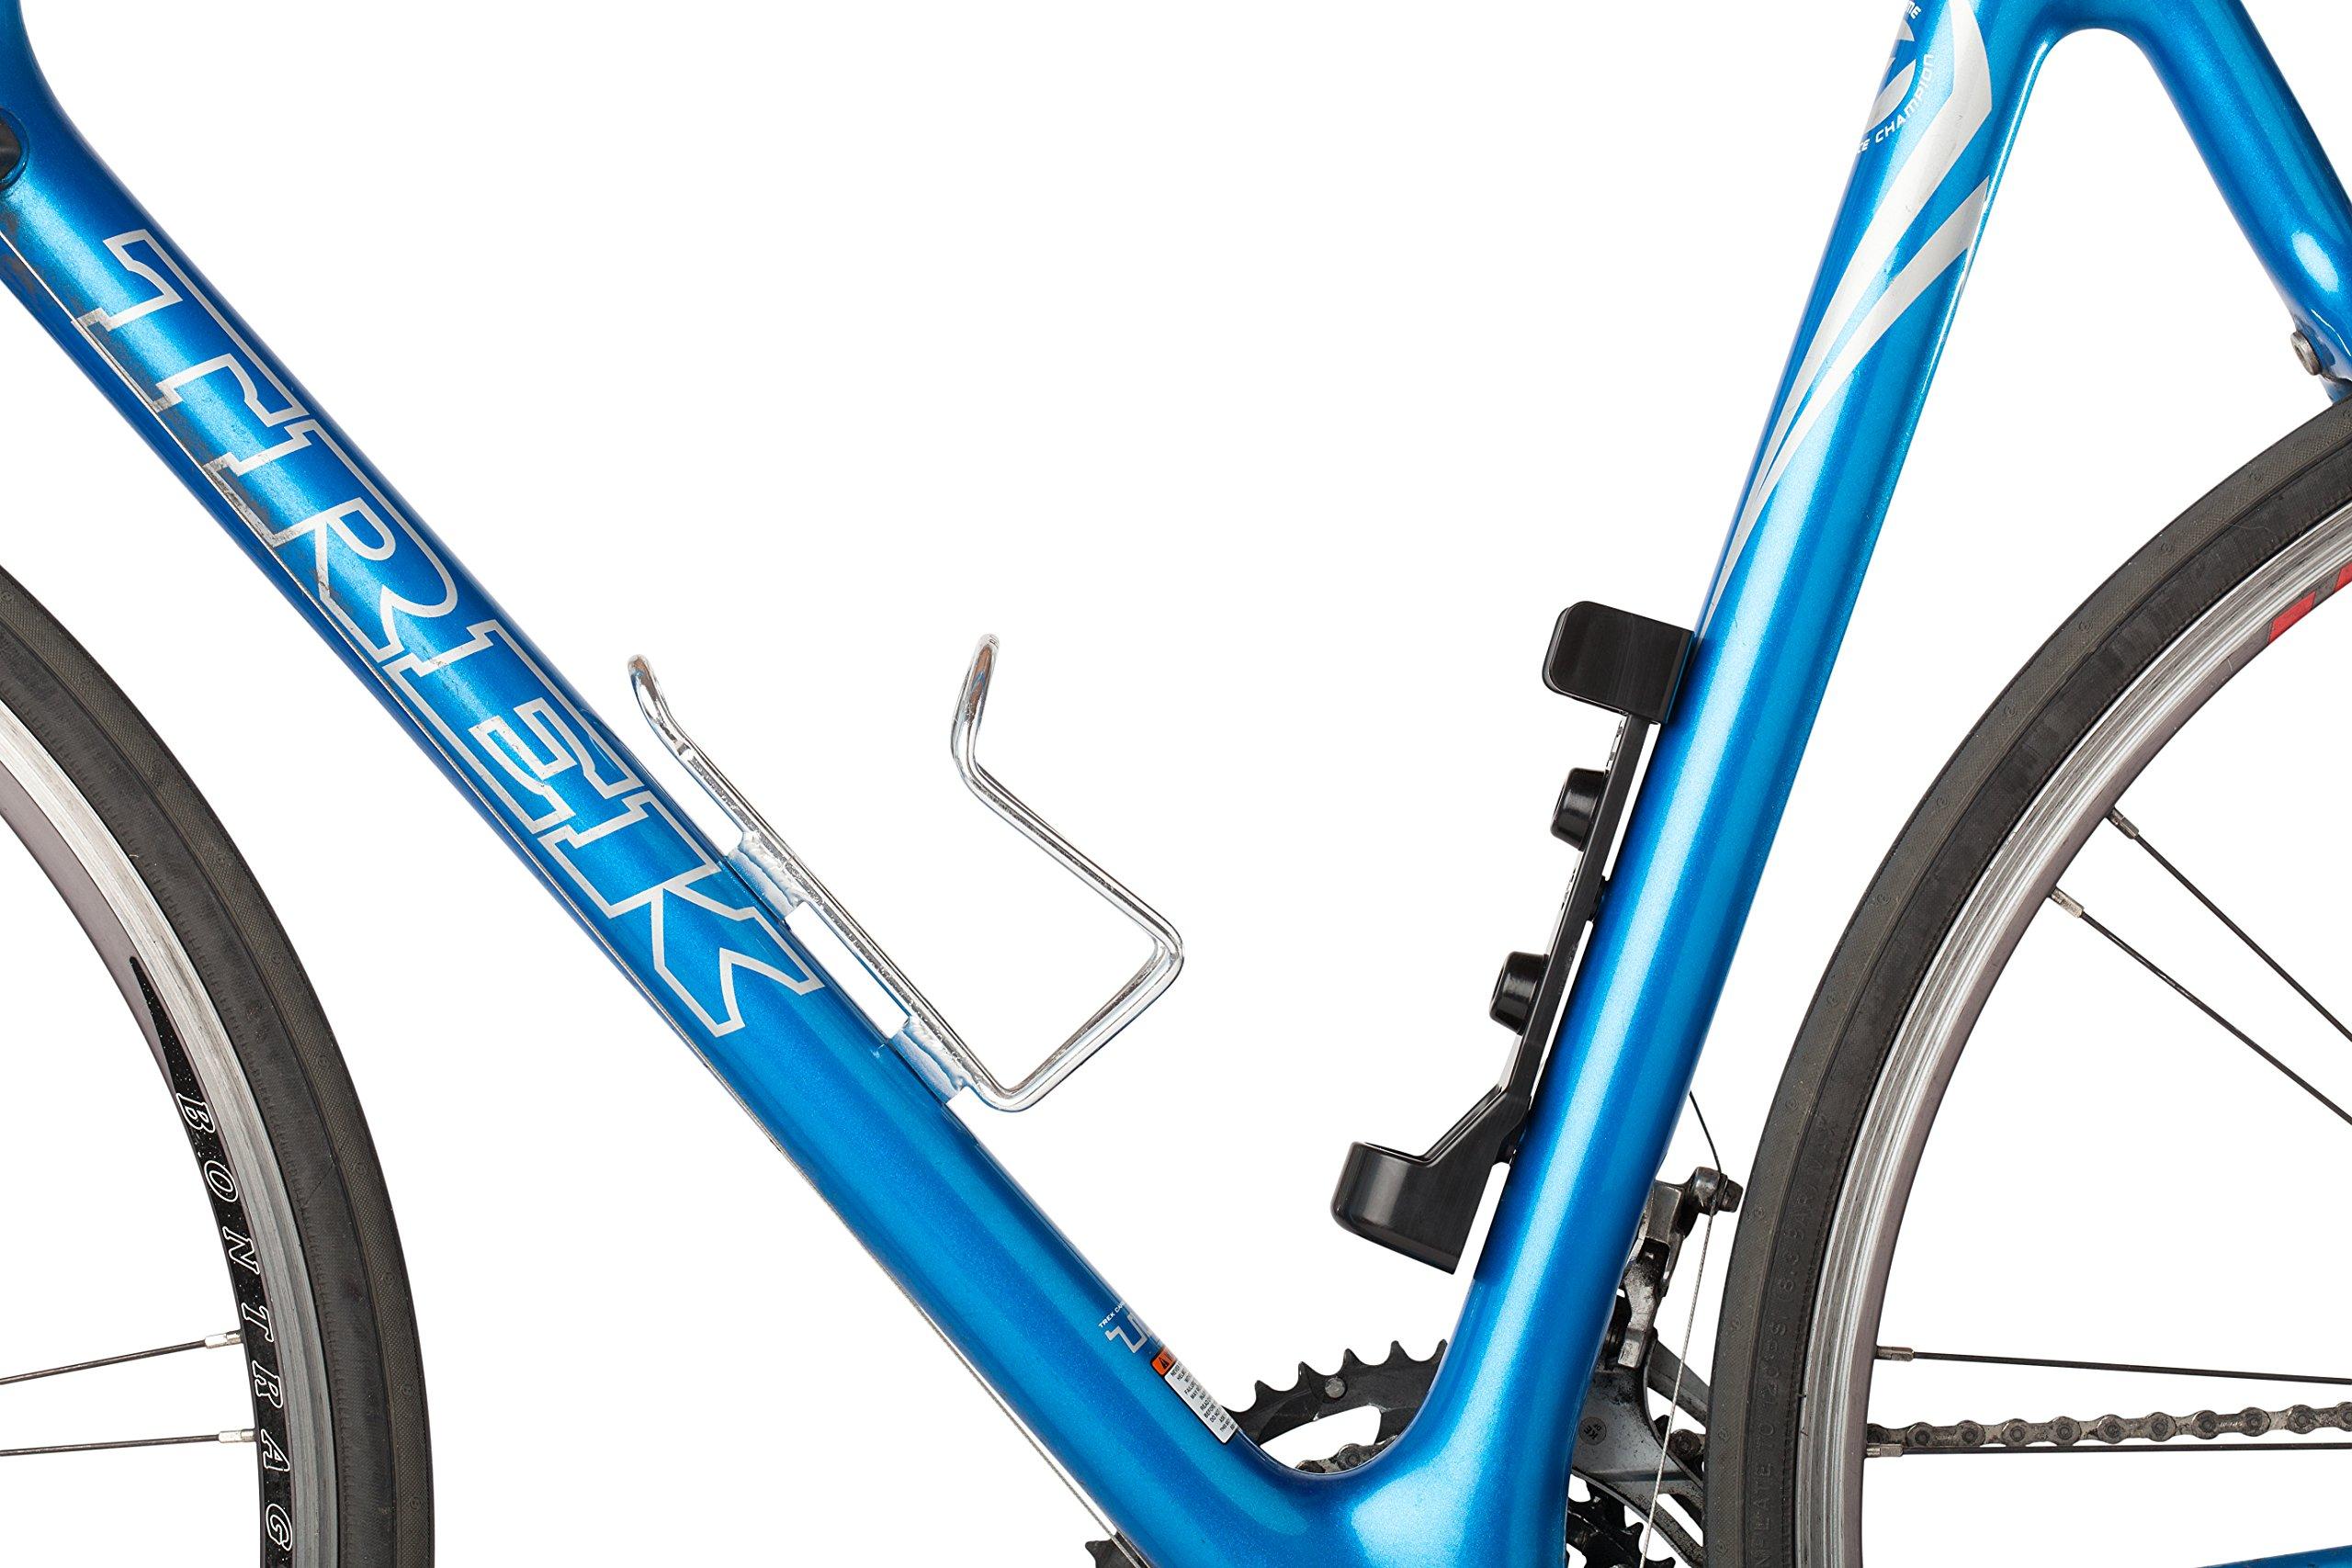 TIGR mini Lightweight Titanium Bicycle Lock & Mounting Clip by TIGR (Image #4)